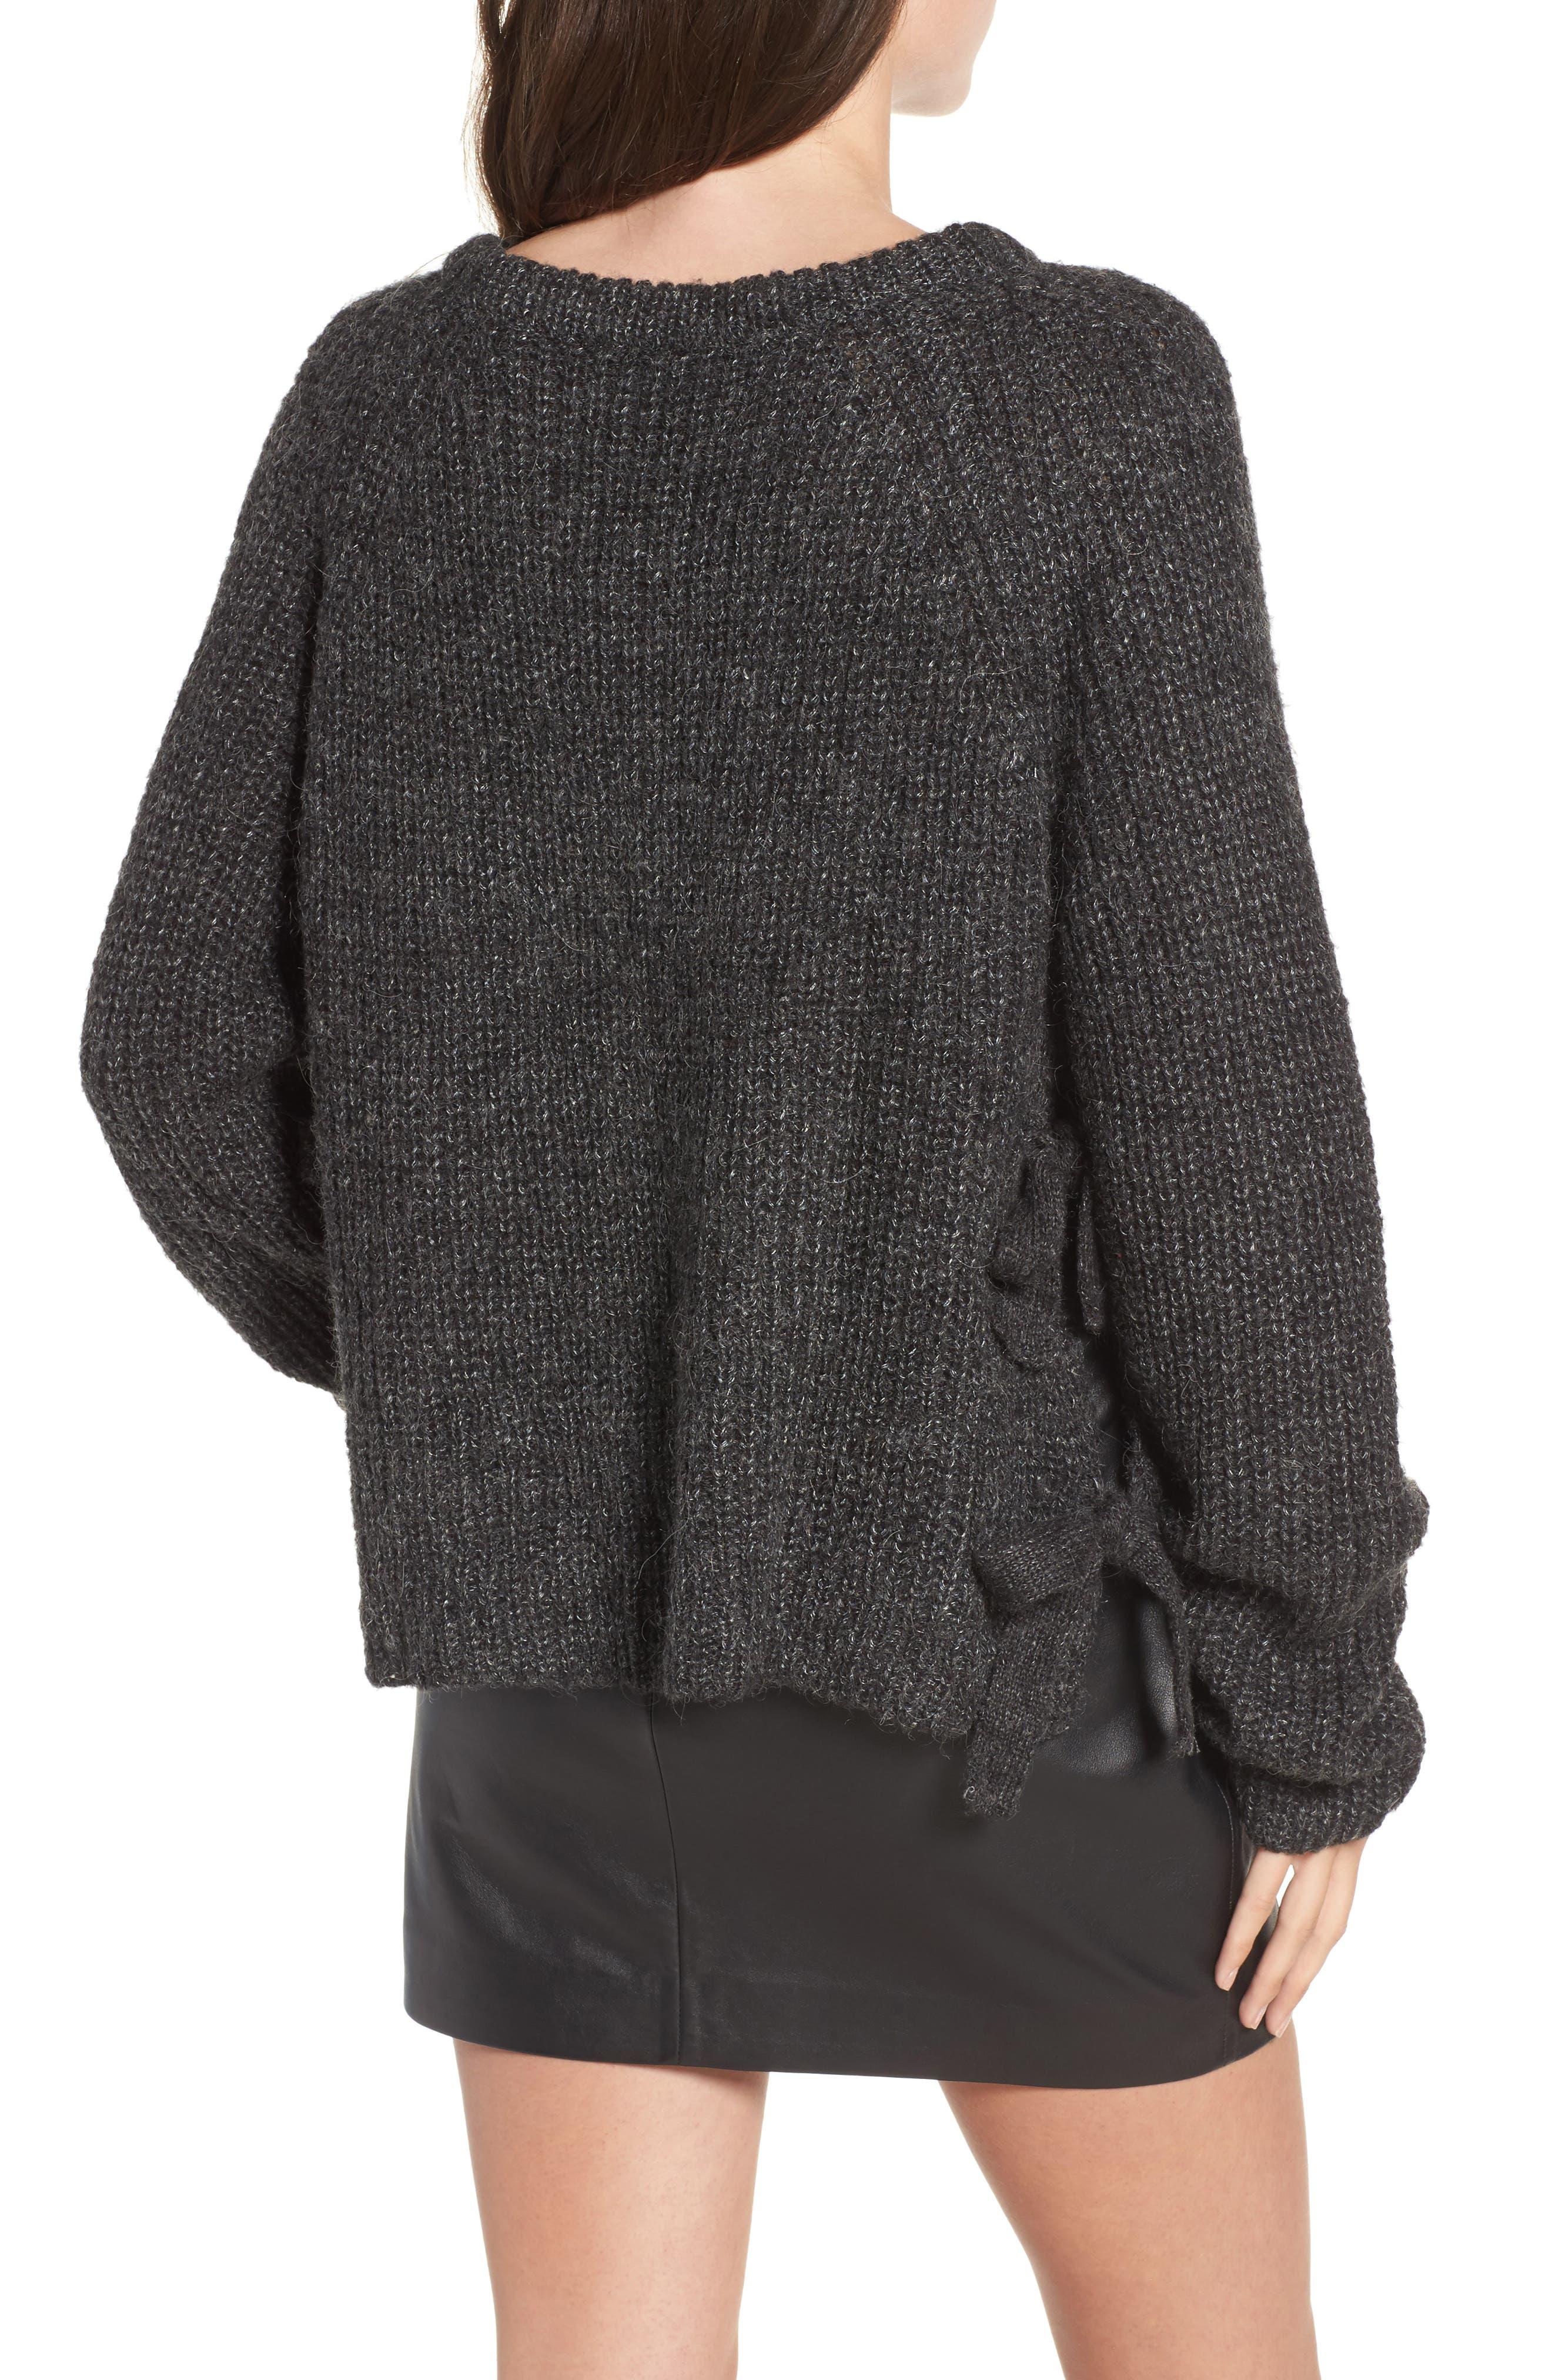 Lexie Side Tie Sweater,                             Alternate thumbnail 2, color,                             020